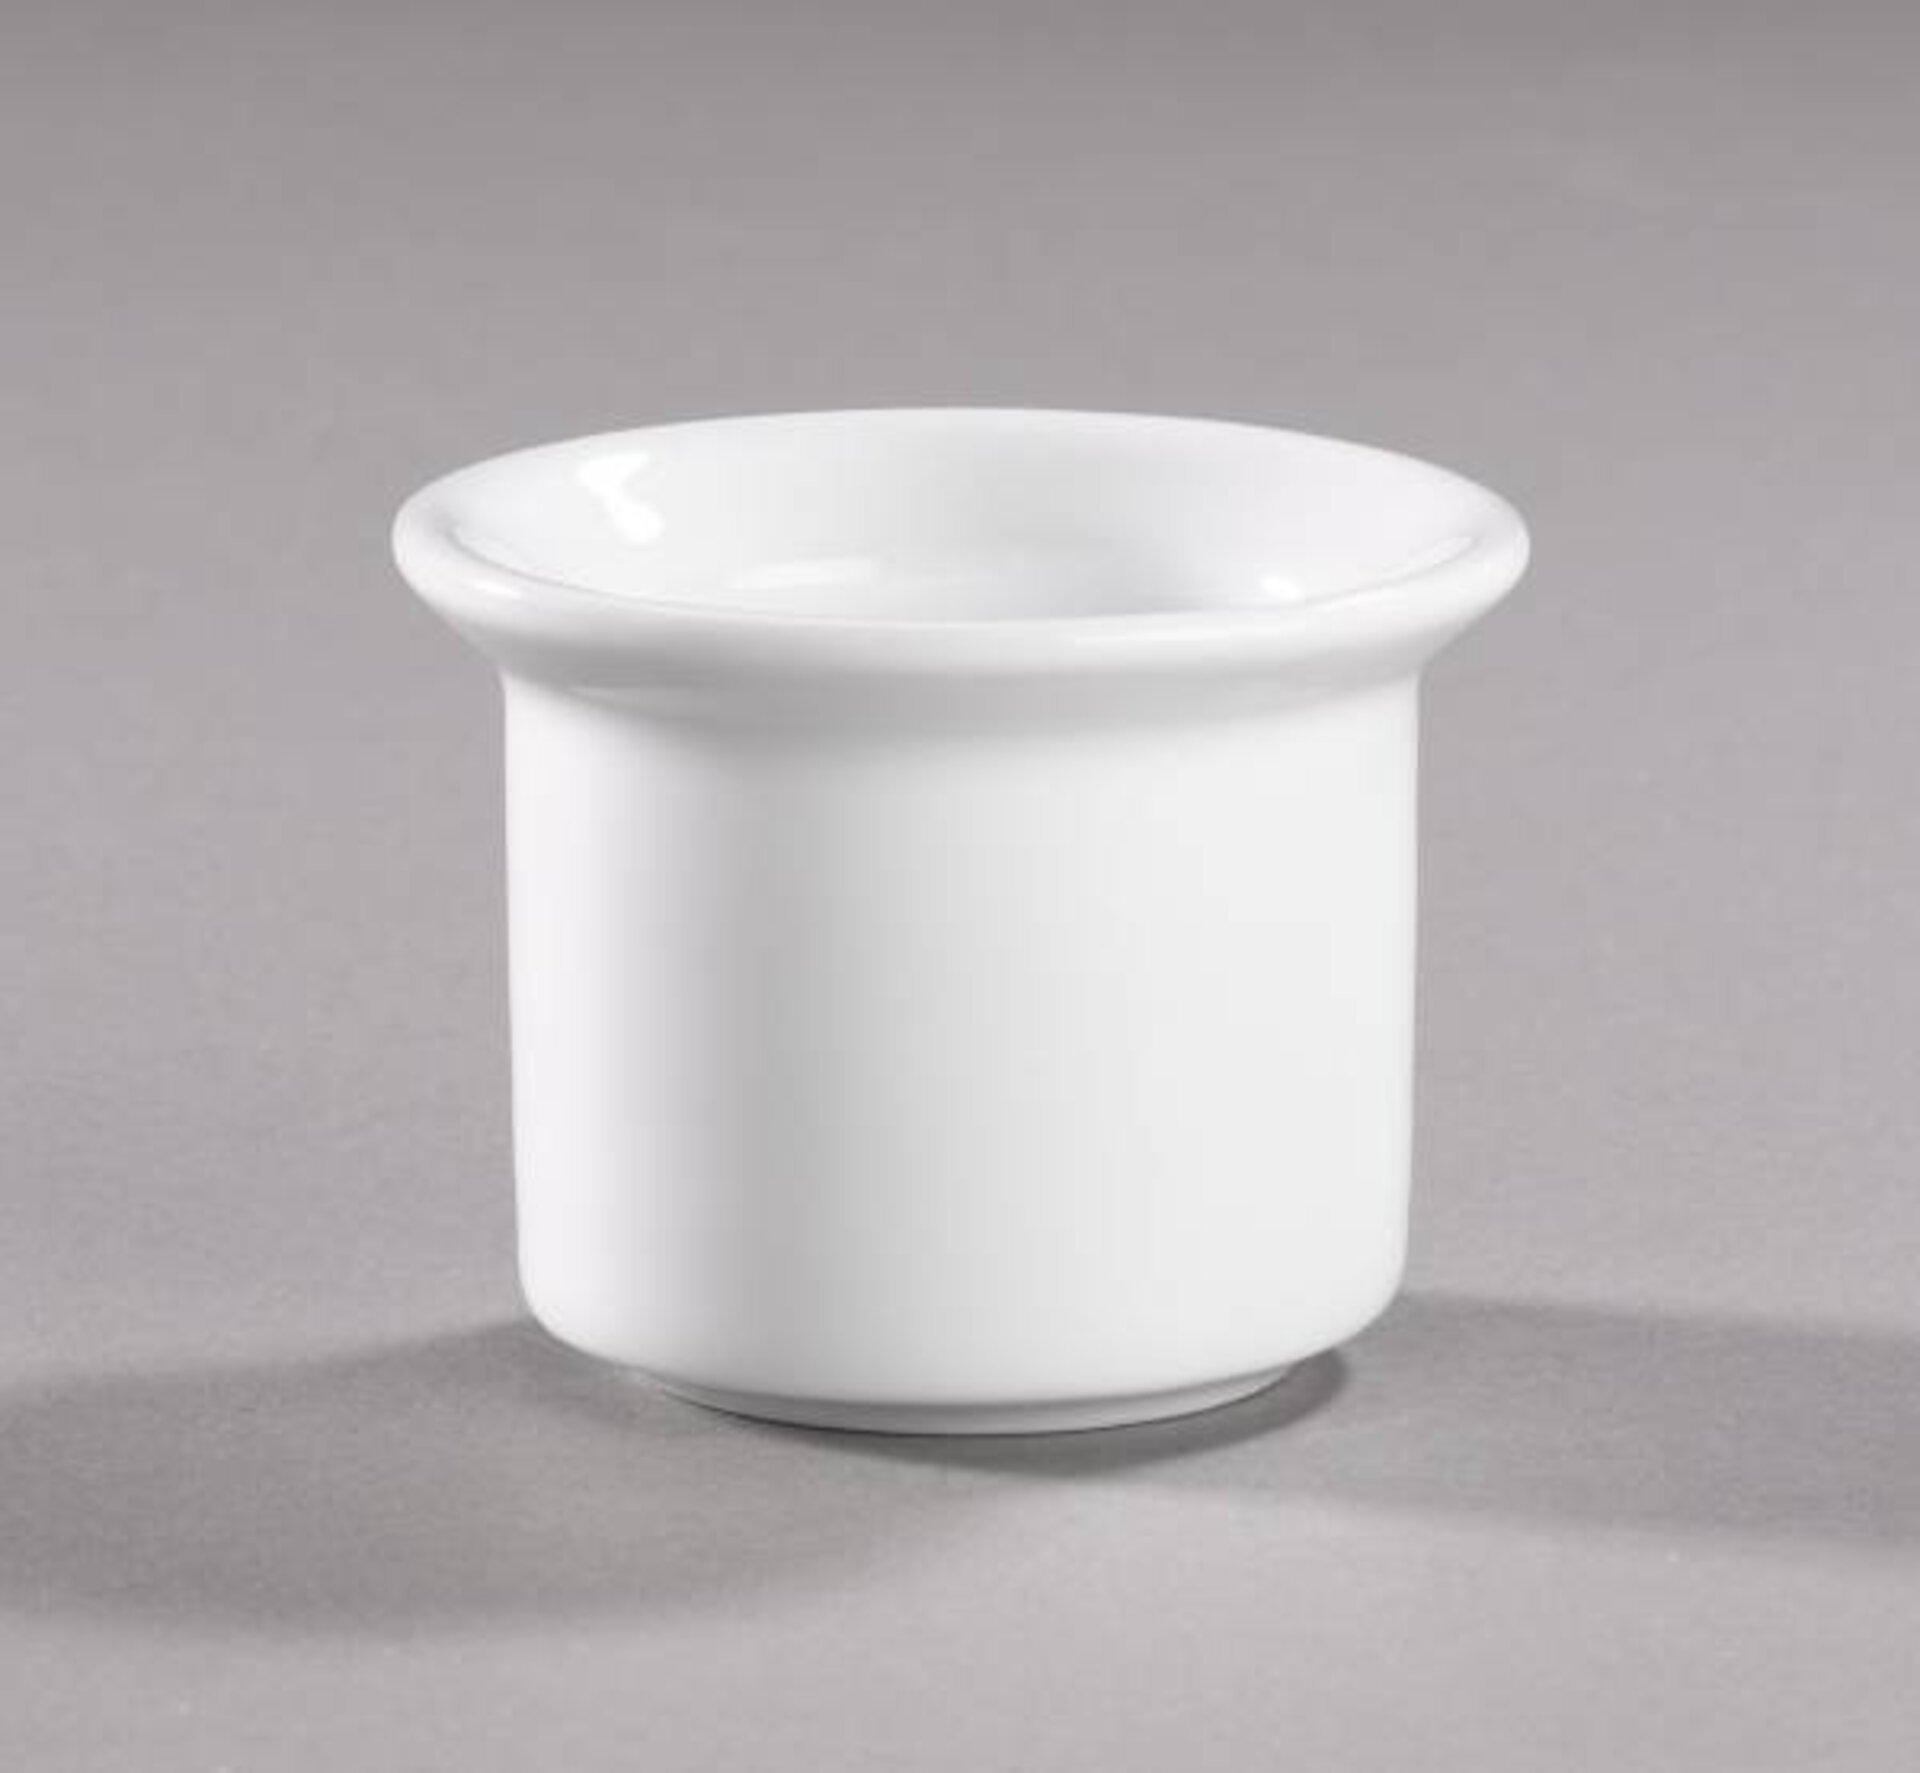 Geschirr 168747 Casa Nova Casa Nova Keramik weiß